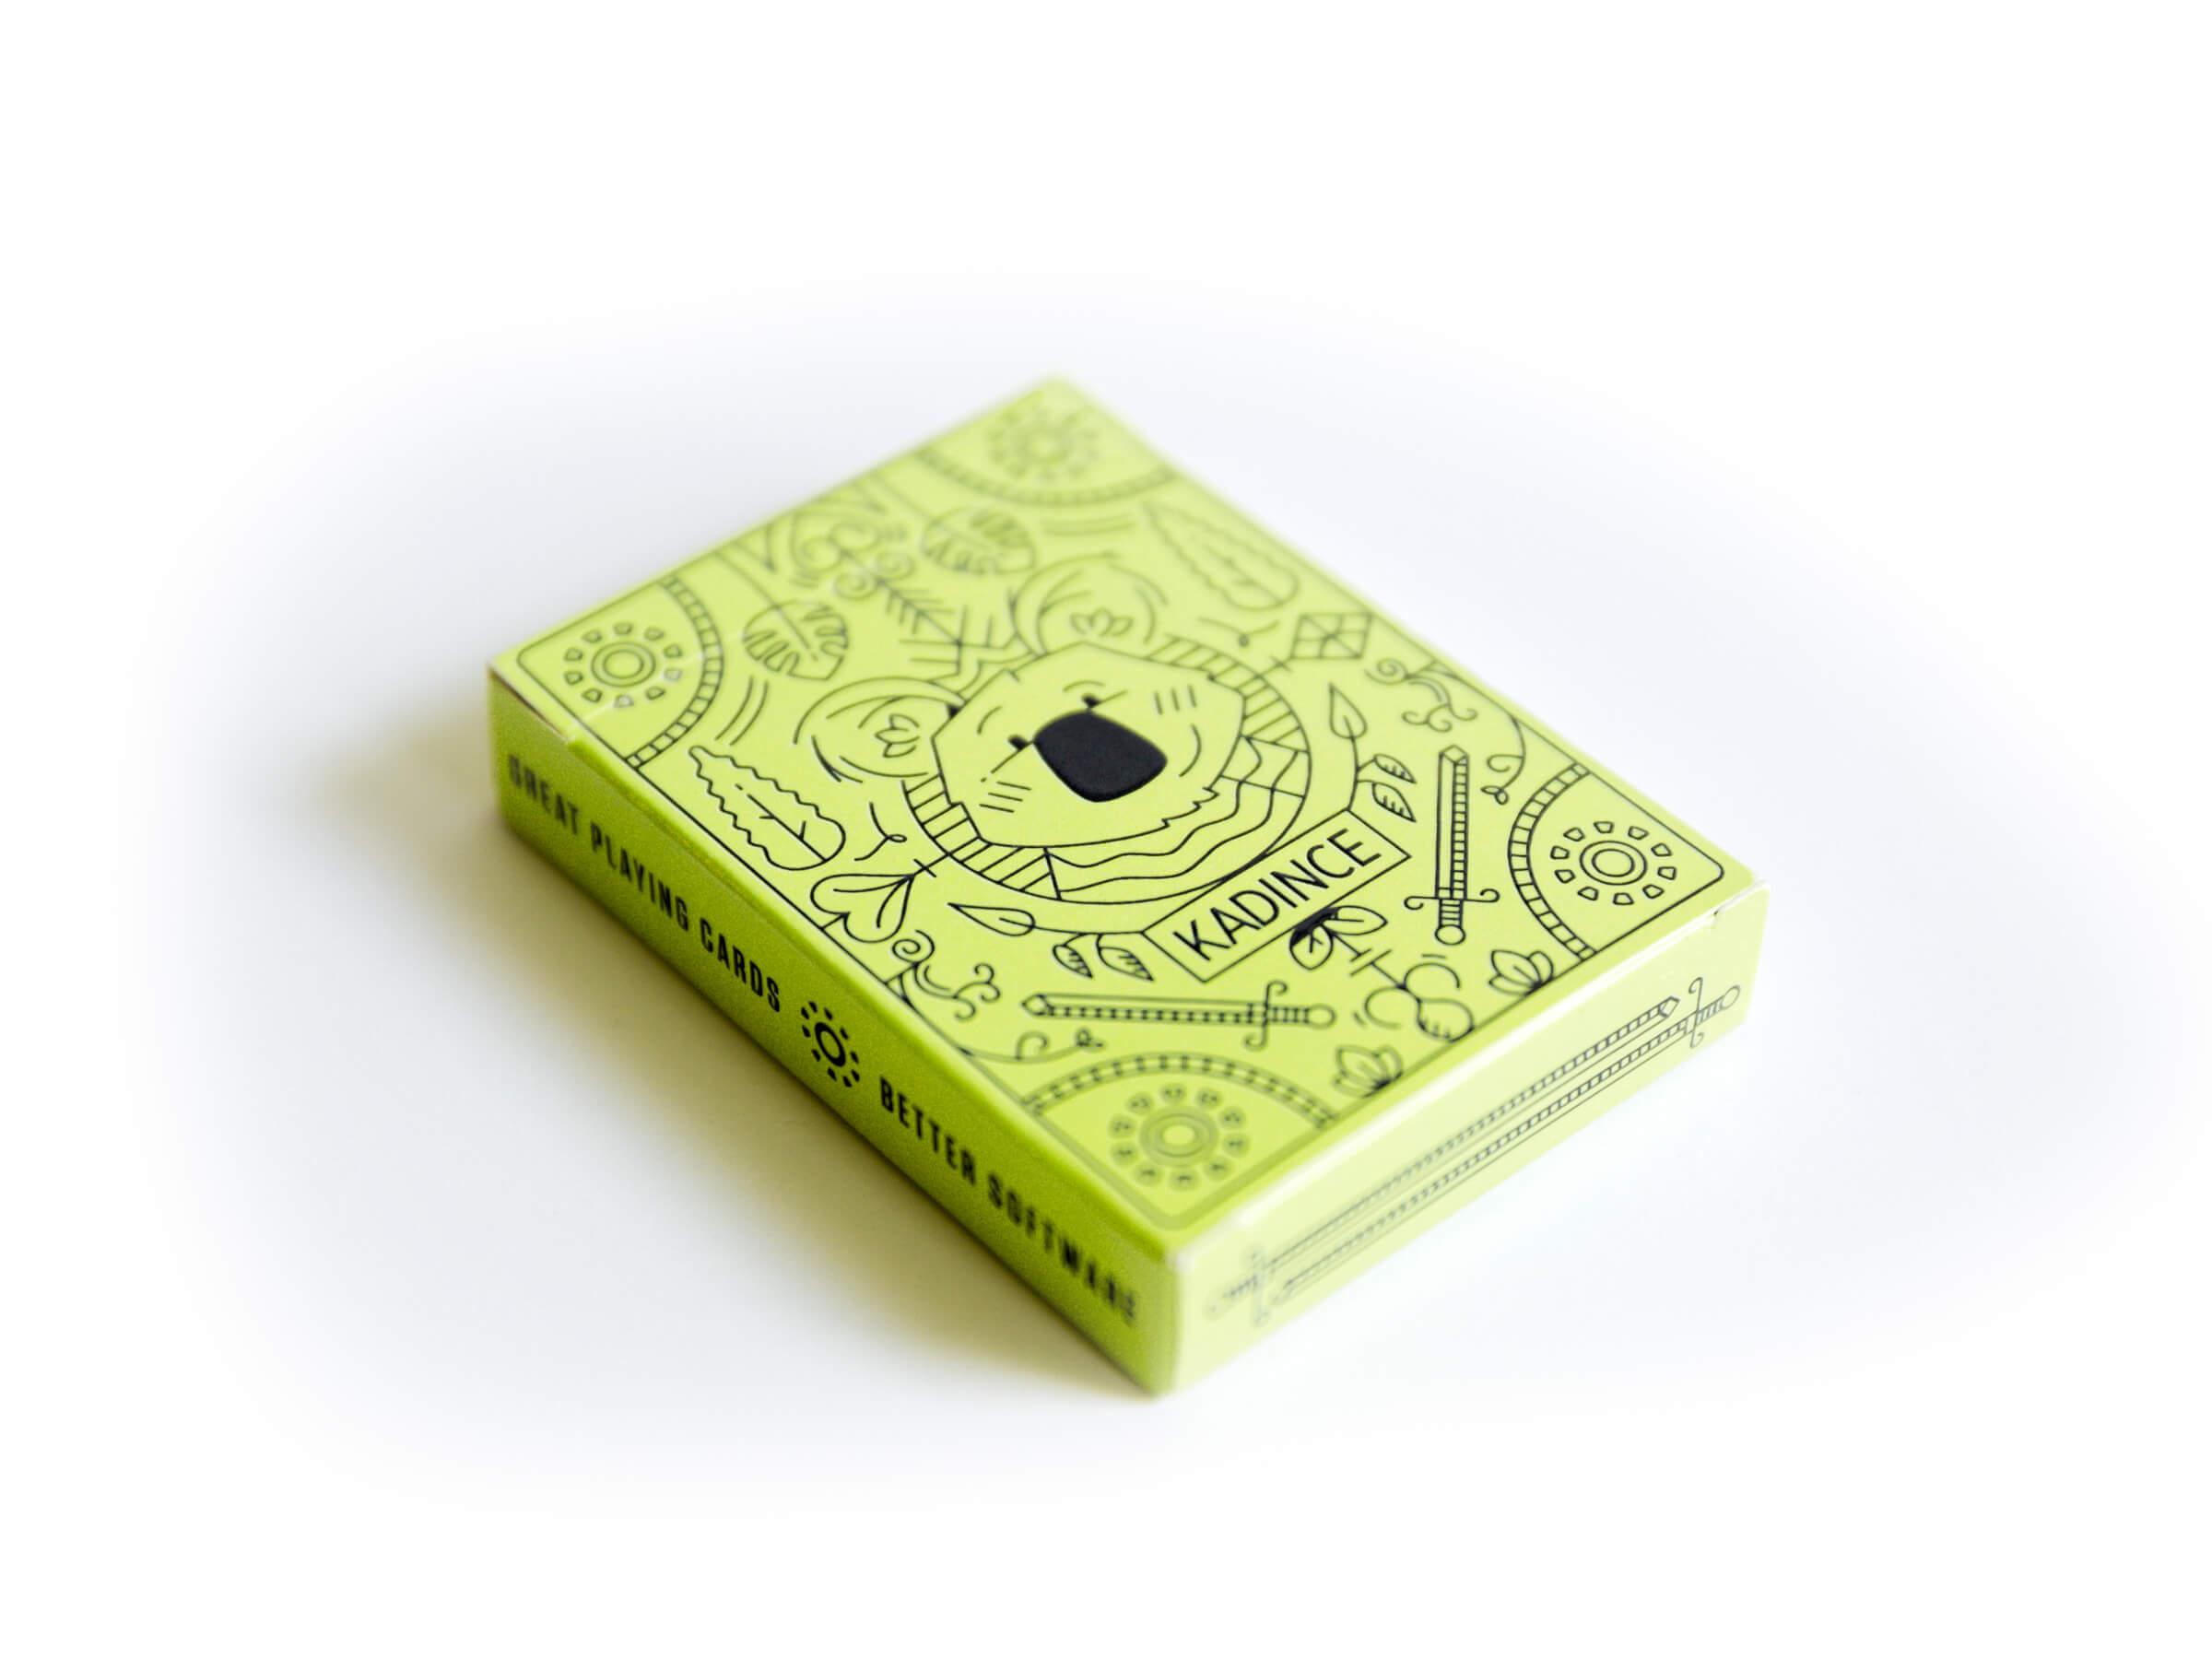 kirk.wallace_bonehaus_koala.cards-box.solo2.jpg